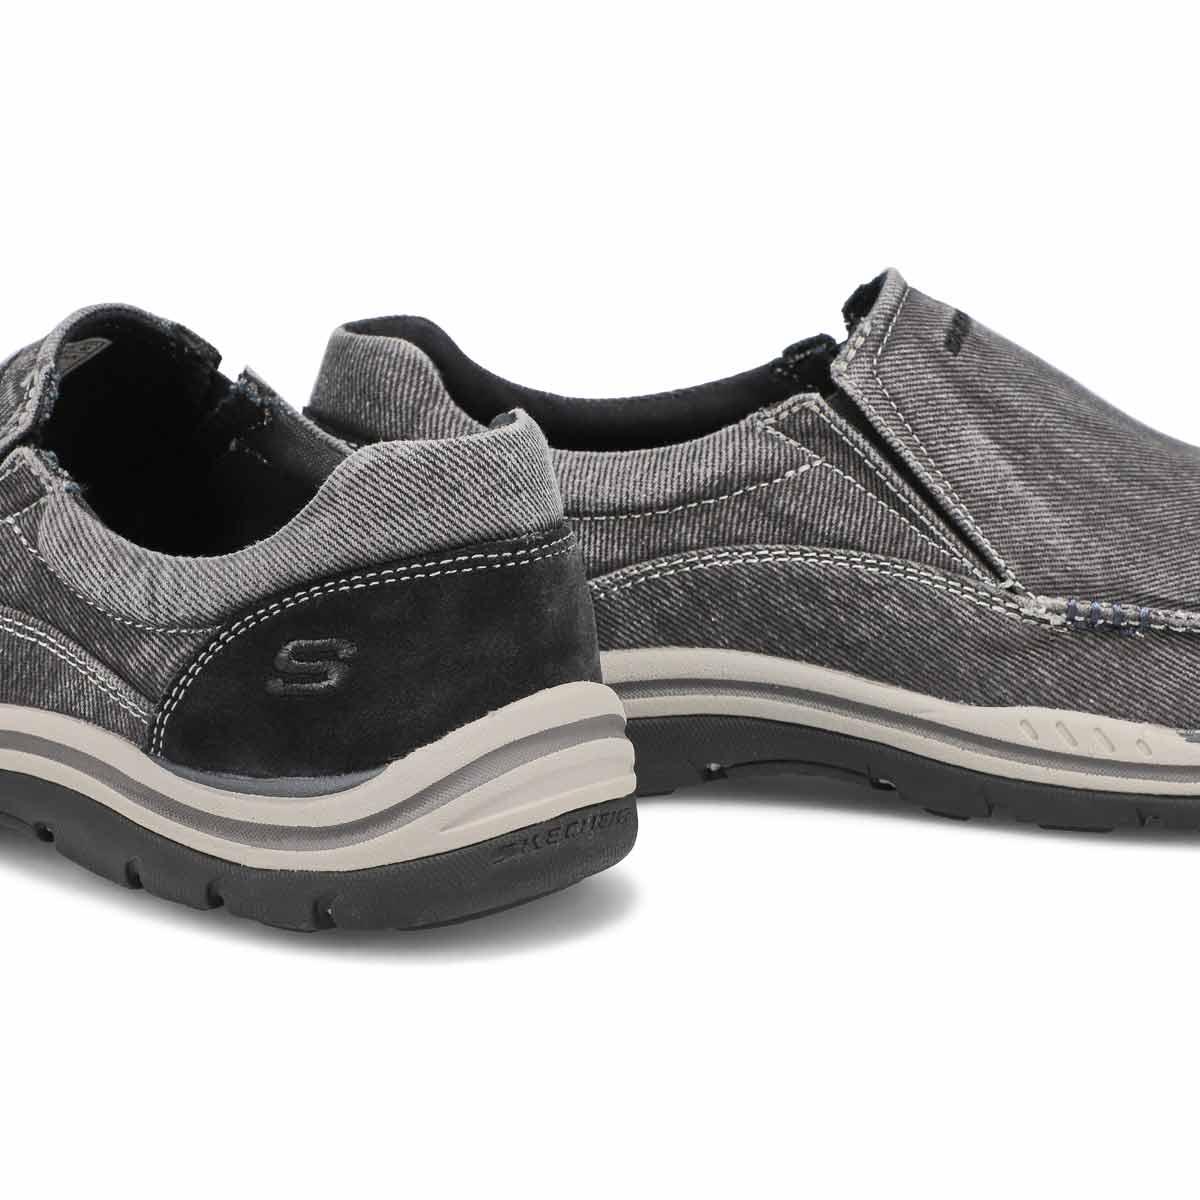 Men's Avillol Shoes - Black